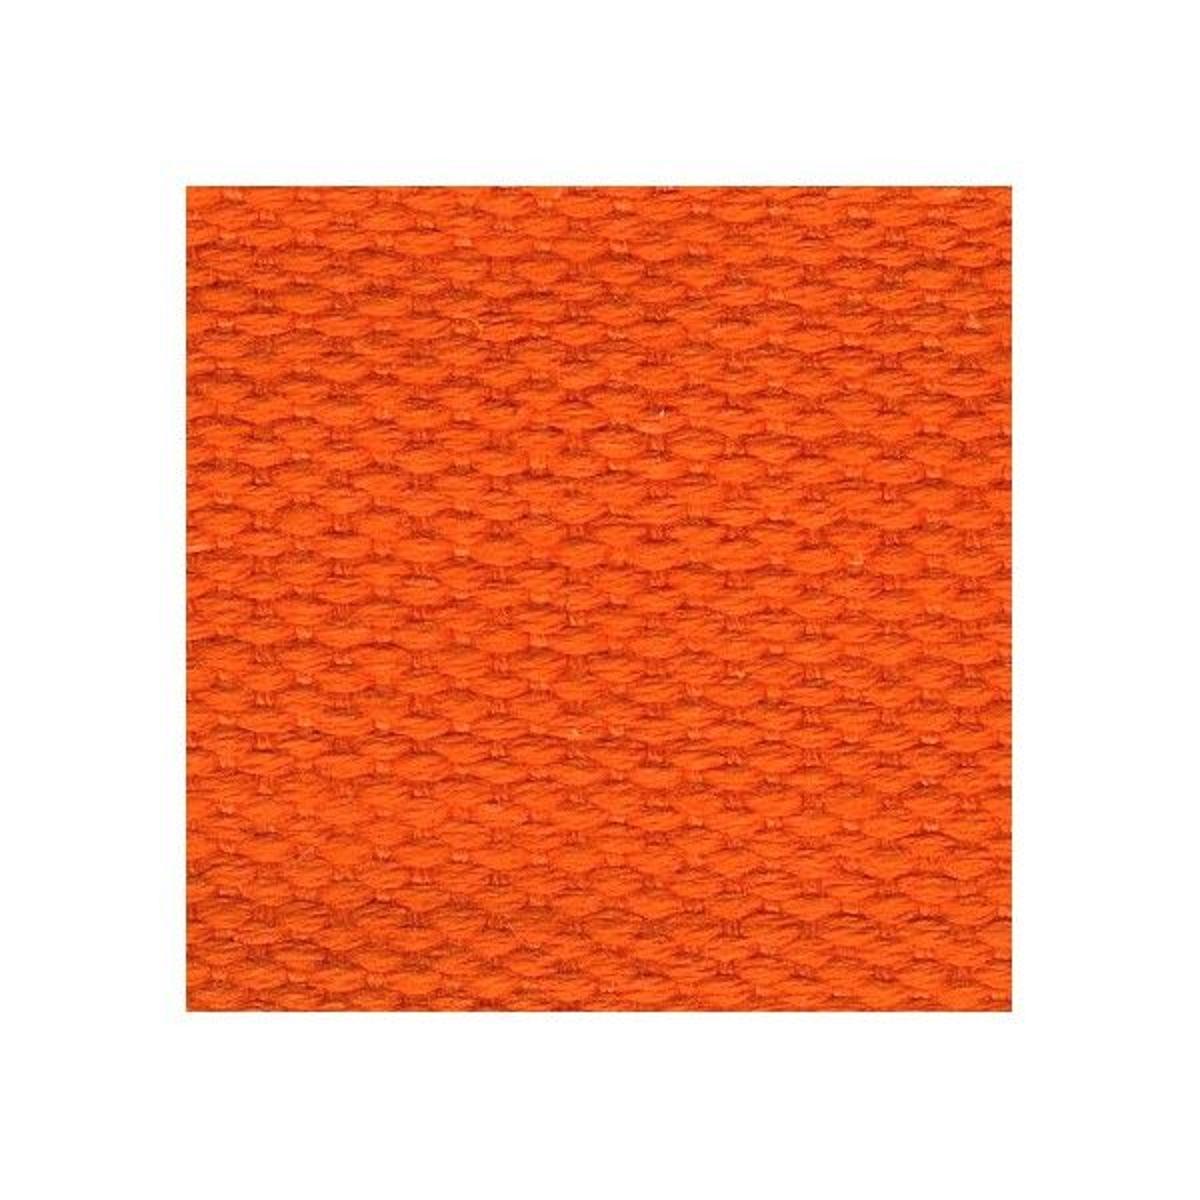 Ruban Sangles Colorées, Mandarine 83